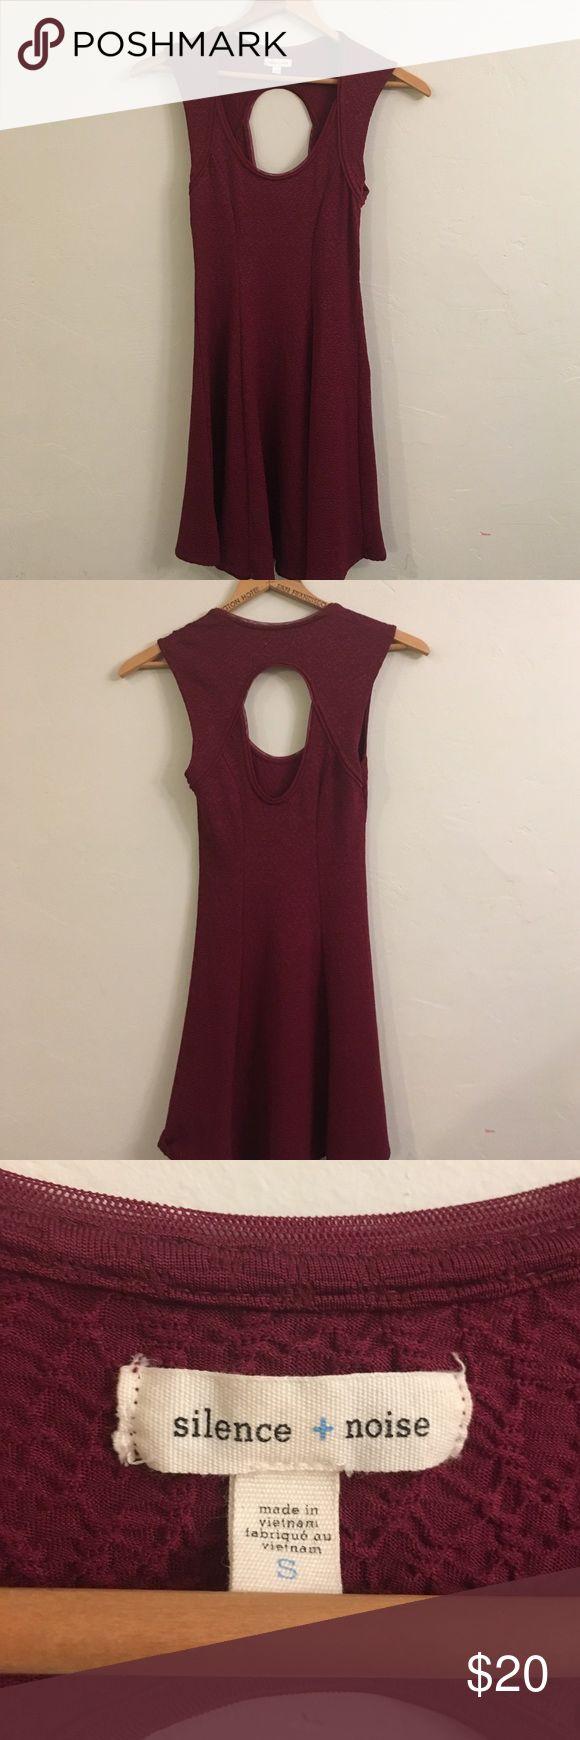 Silence + Noise Open Back Dress Maroon skater dress with open back. Like-new condition. silence + noise Dresses Mini